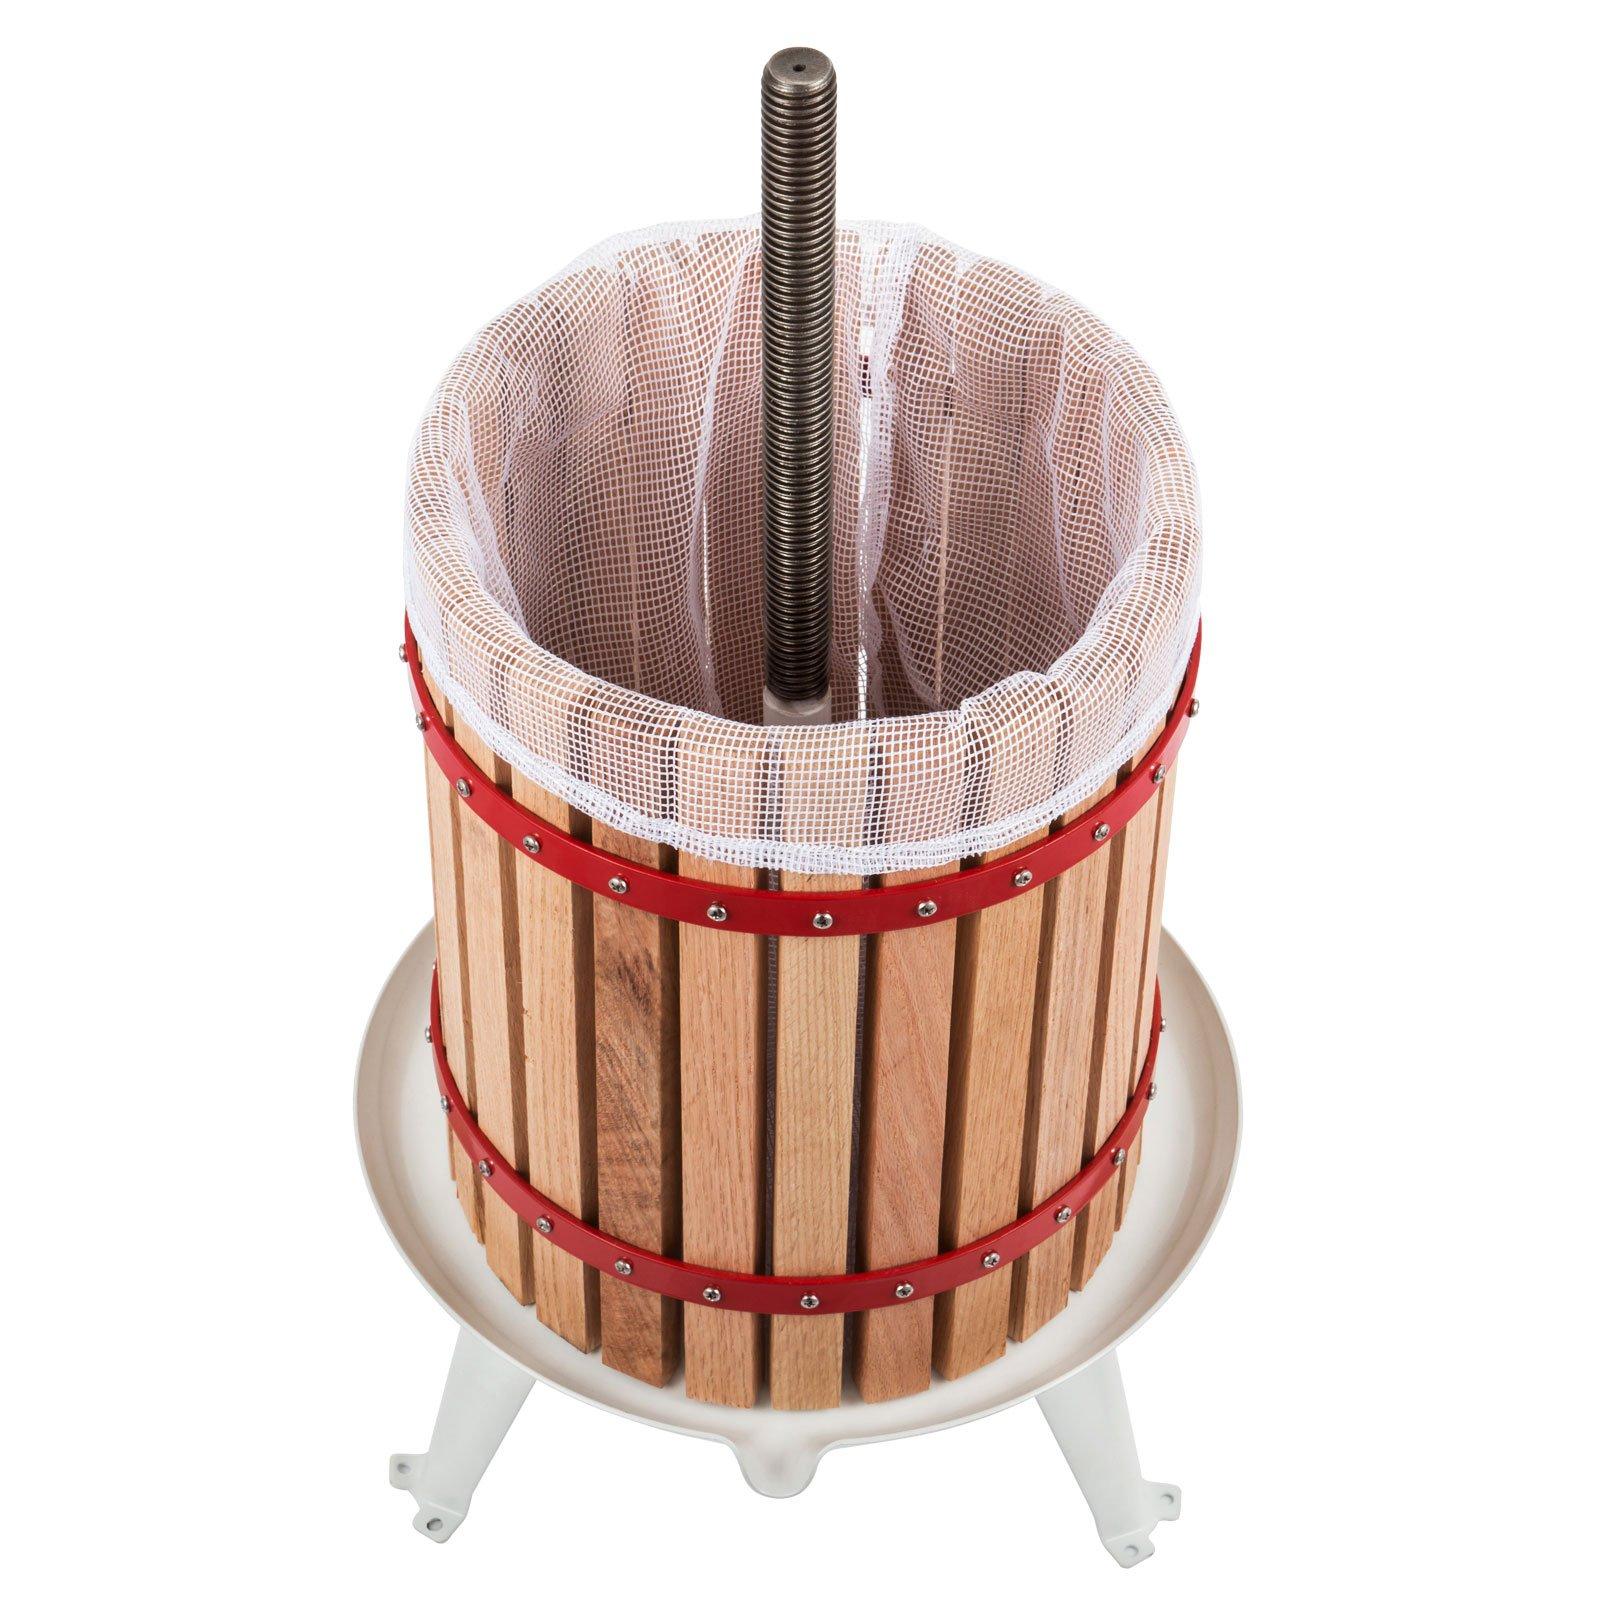 OrangeA 4.7 Gallon Fruit and Wine Press Solid Wood Basket Fruit and Wine Manual Press Press Cider Apple Grape Crusher Juice Maker (4.7 Gallon) by OrangeA (Image #3)